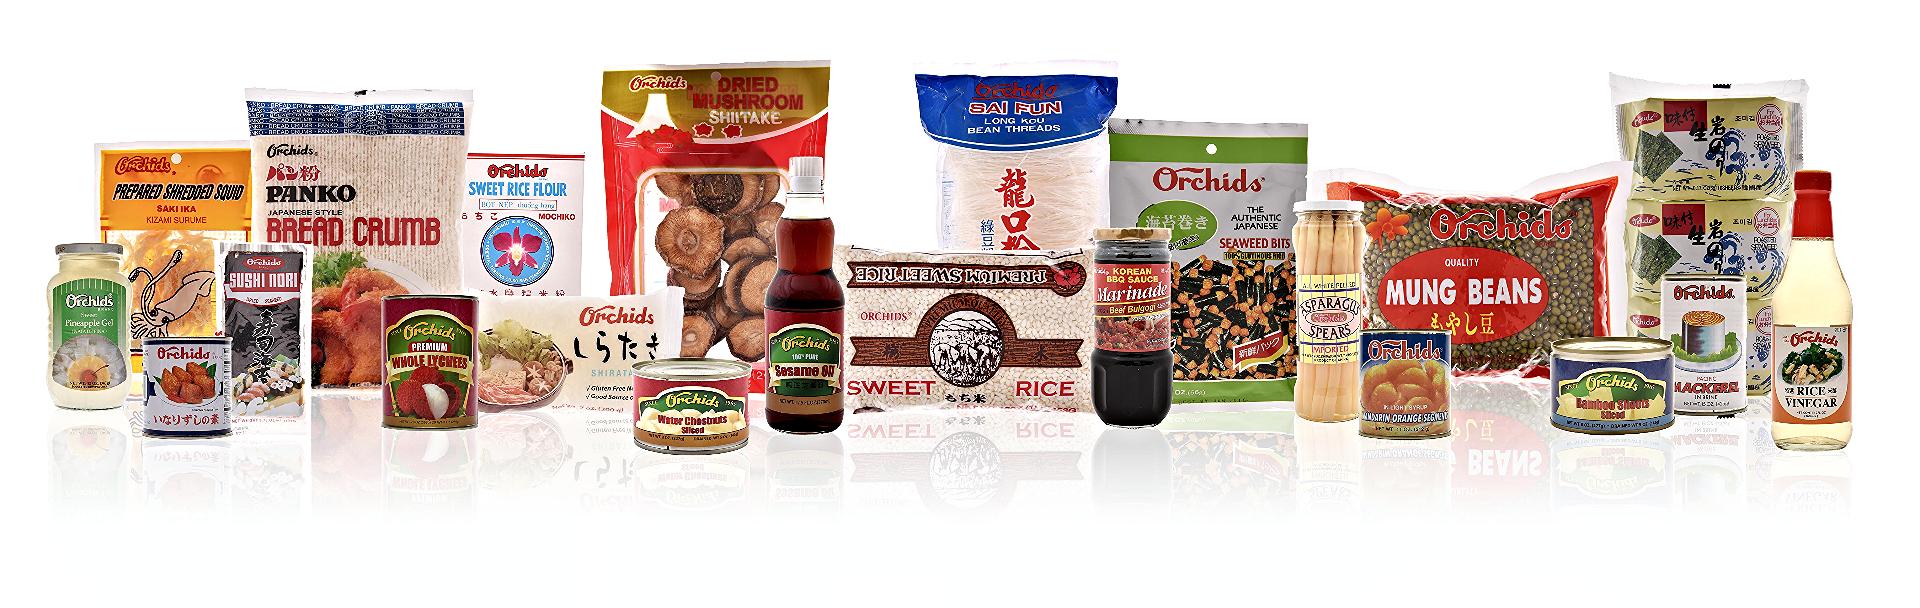 CTC Food International, Inc